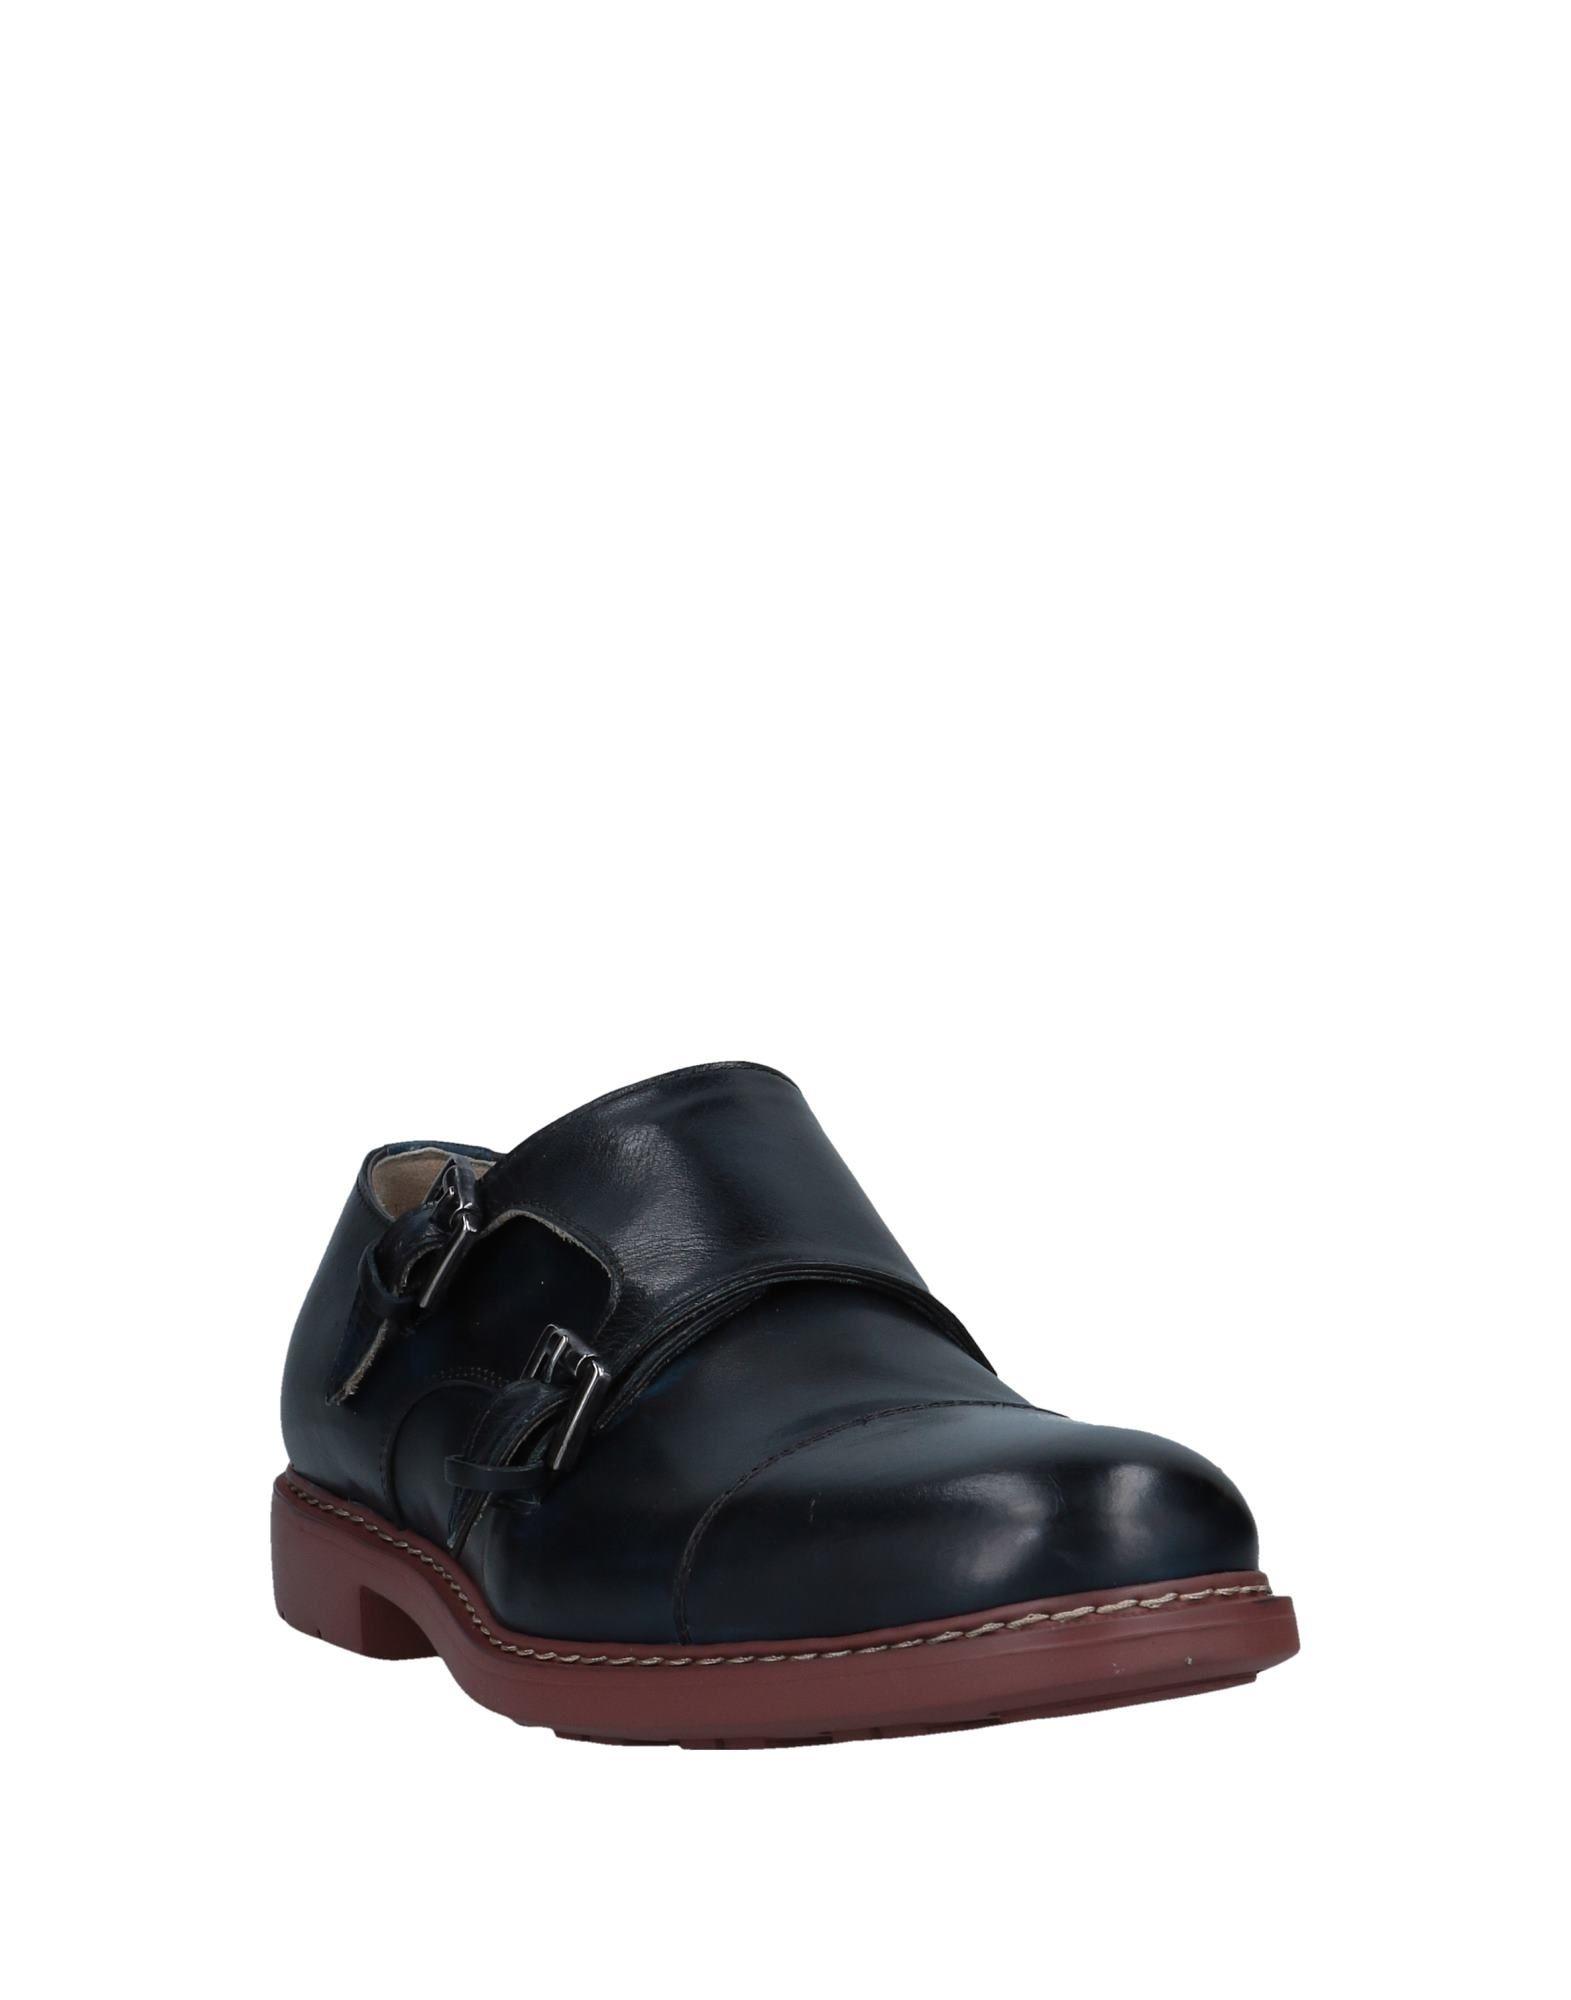 Baldinini 11554708OS Mokassins Herren  11554708OS Baldinini Gute Qualität beliebte Schuhe 69f923